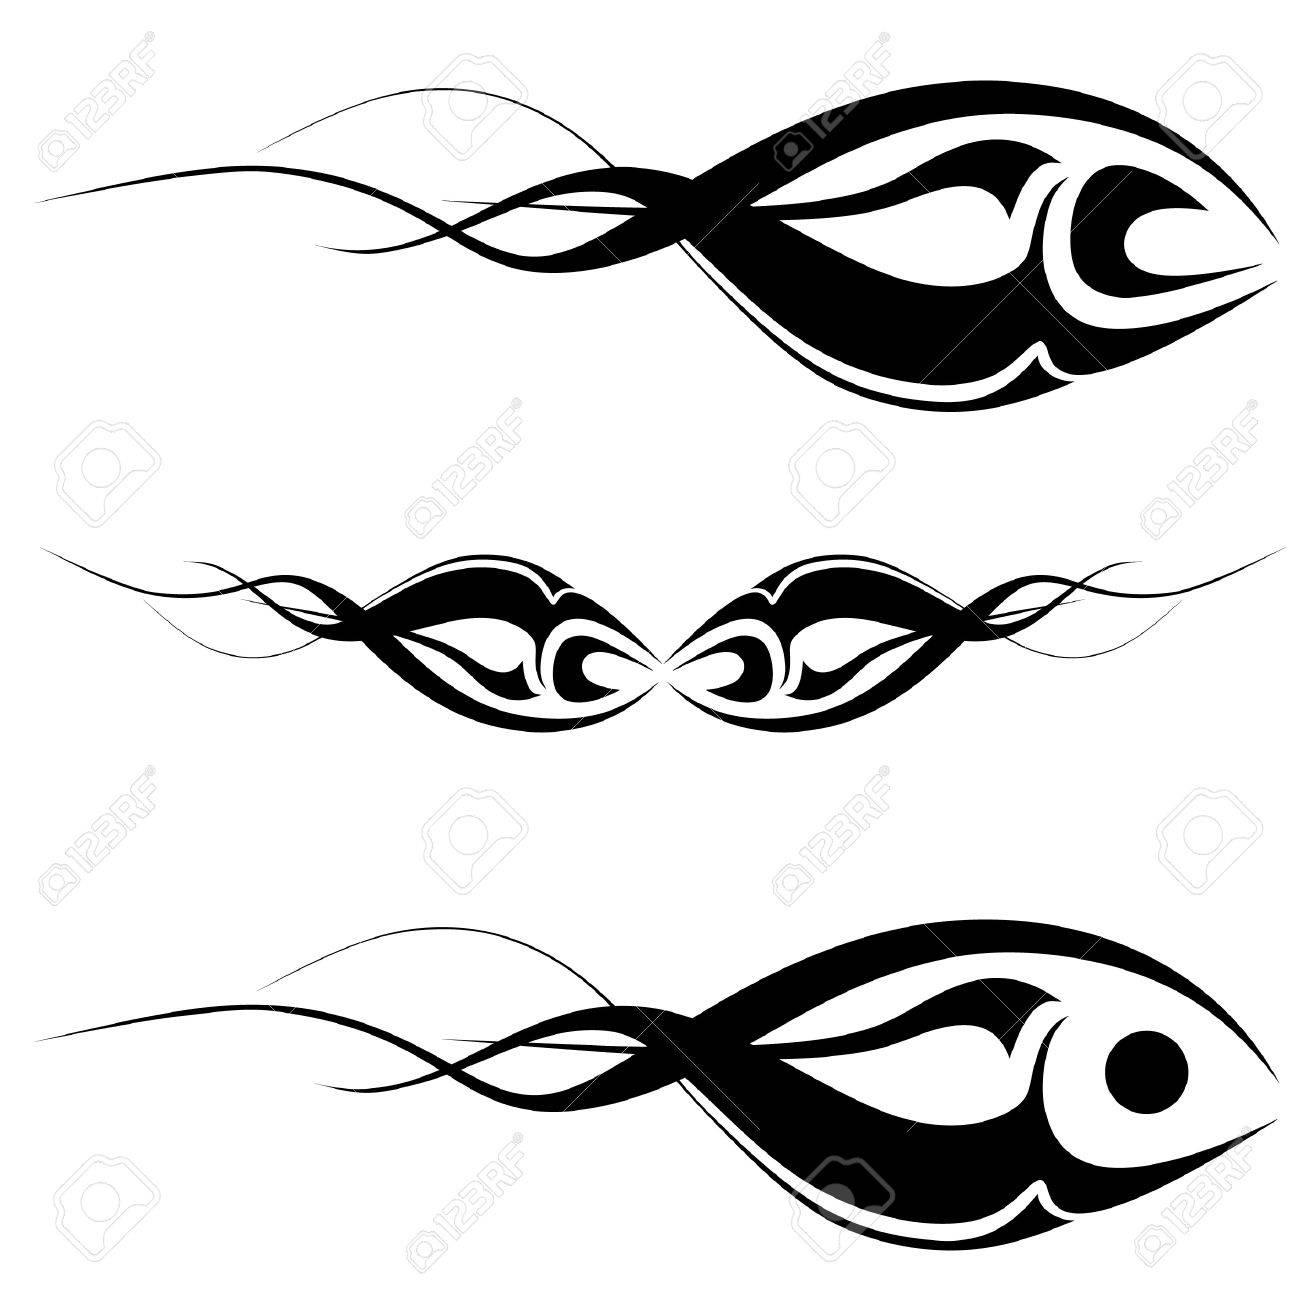 tribal art tattoo Stock Vector - 10592791